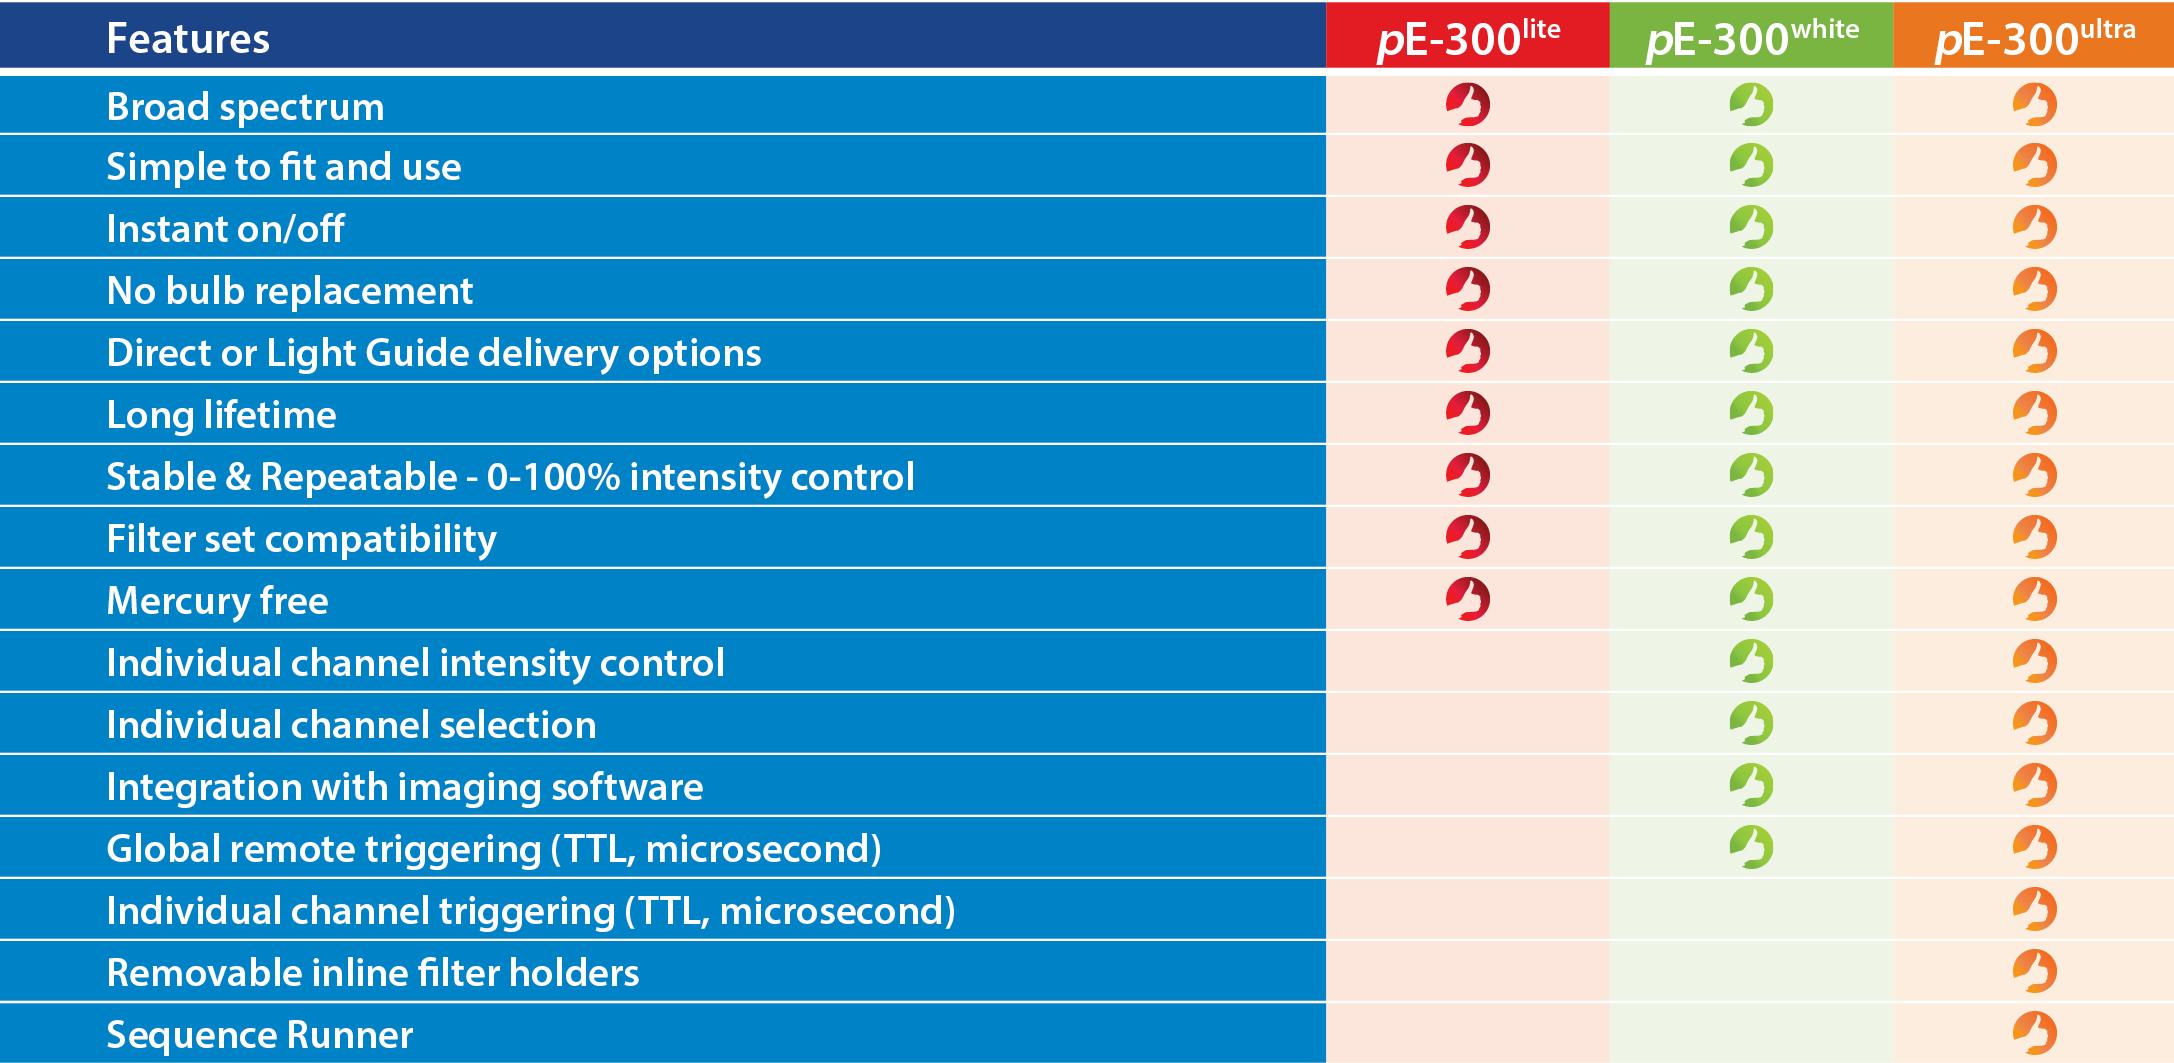 pE-300white | LED Microscope Illuminator | CoolLED LED